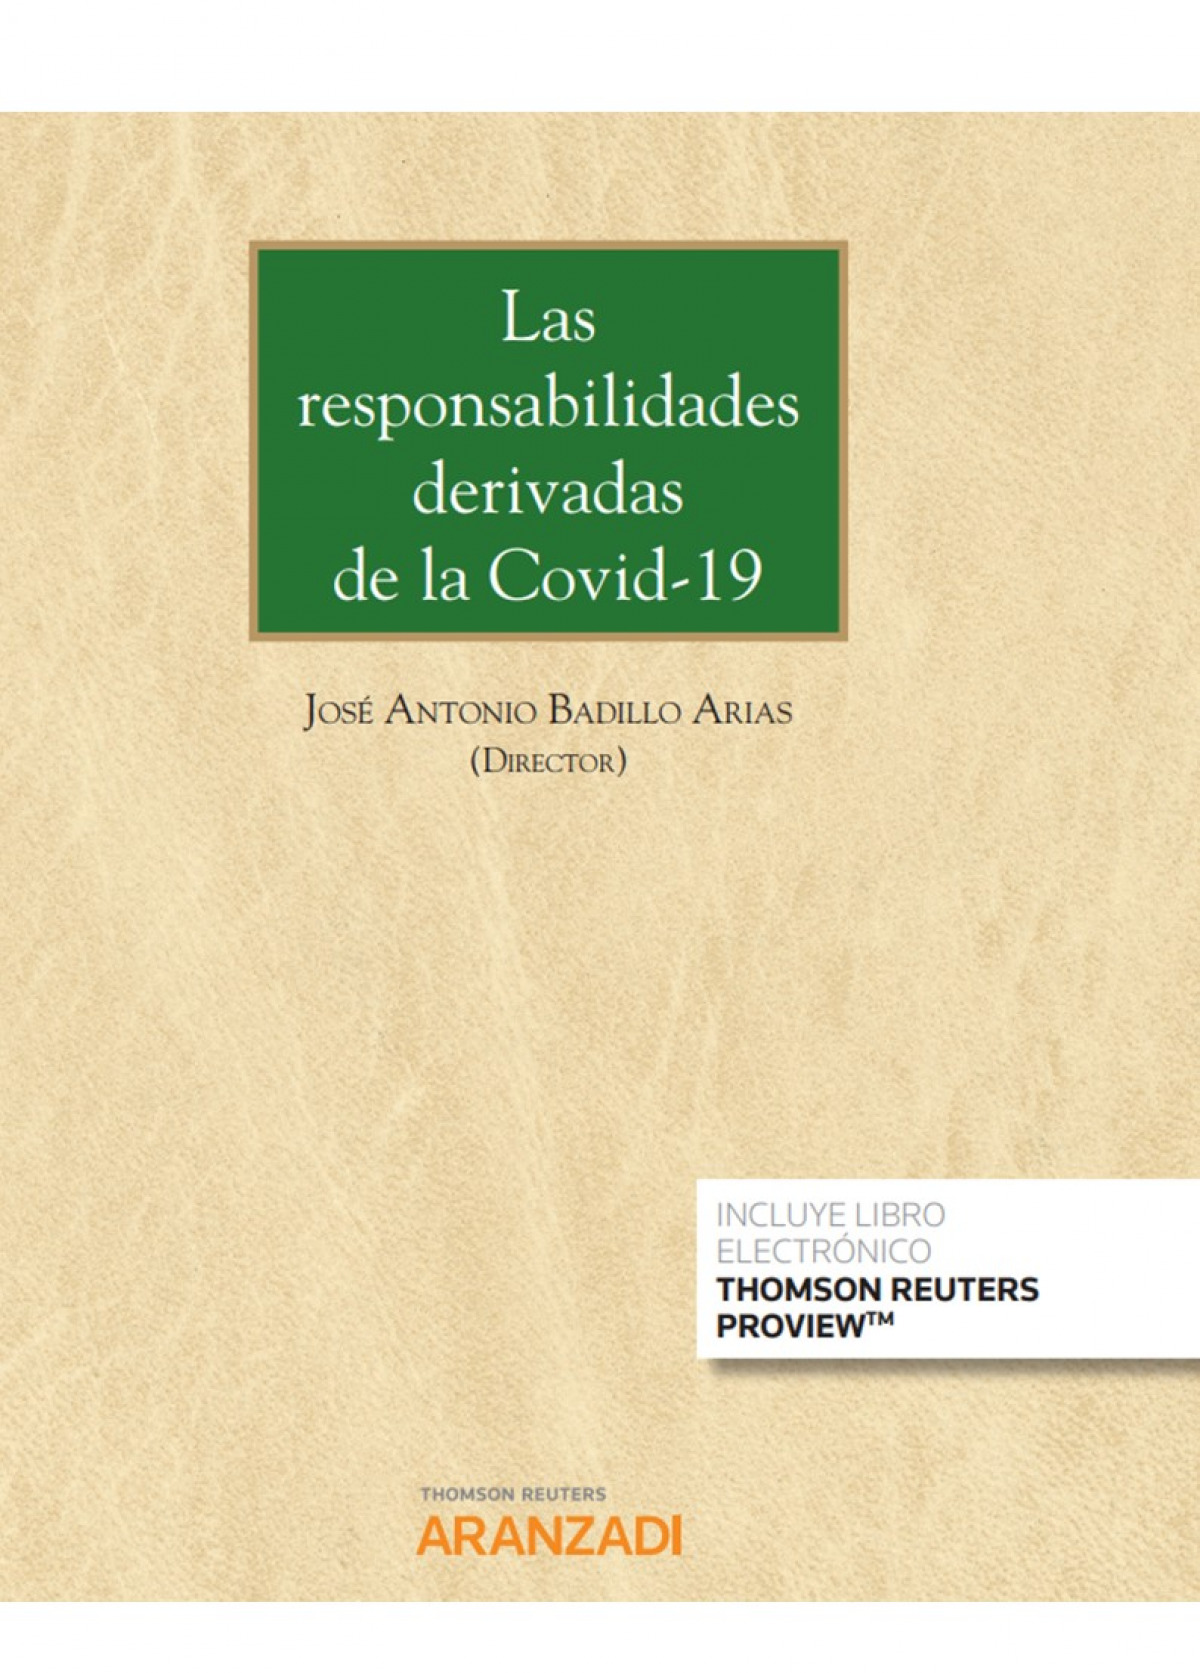 Las responsabilidades derivadas de la Covid-19 (Papel + e-book)